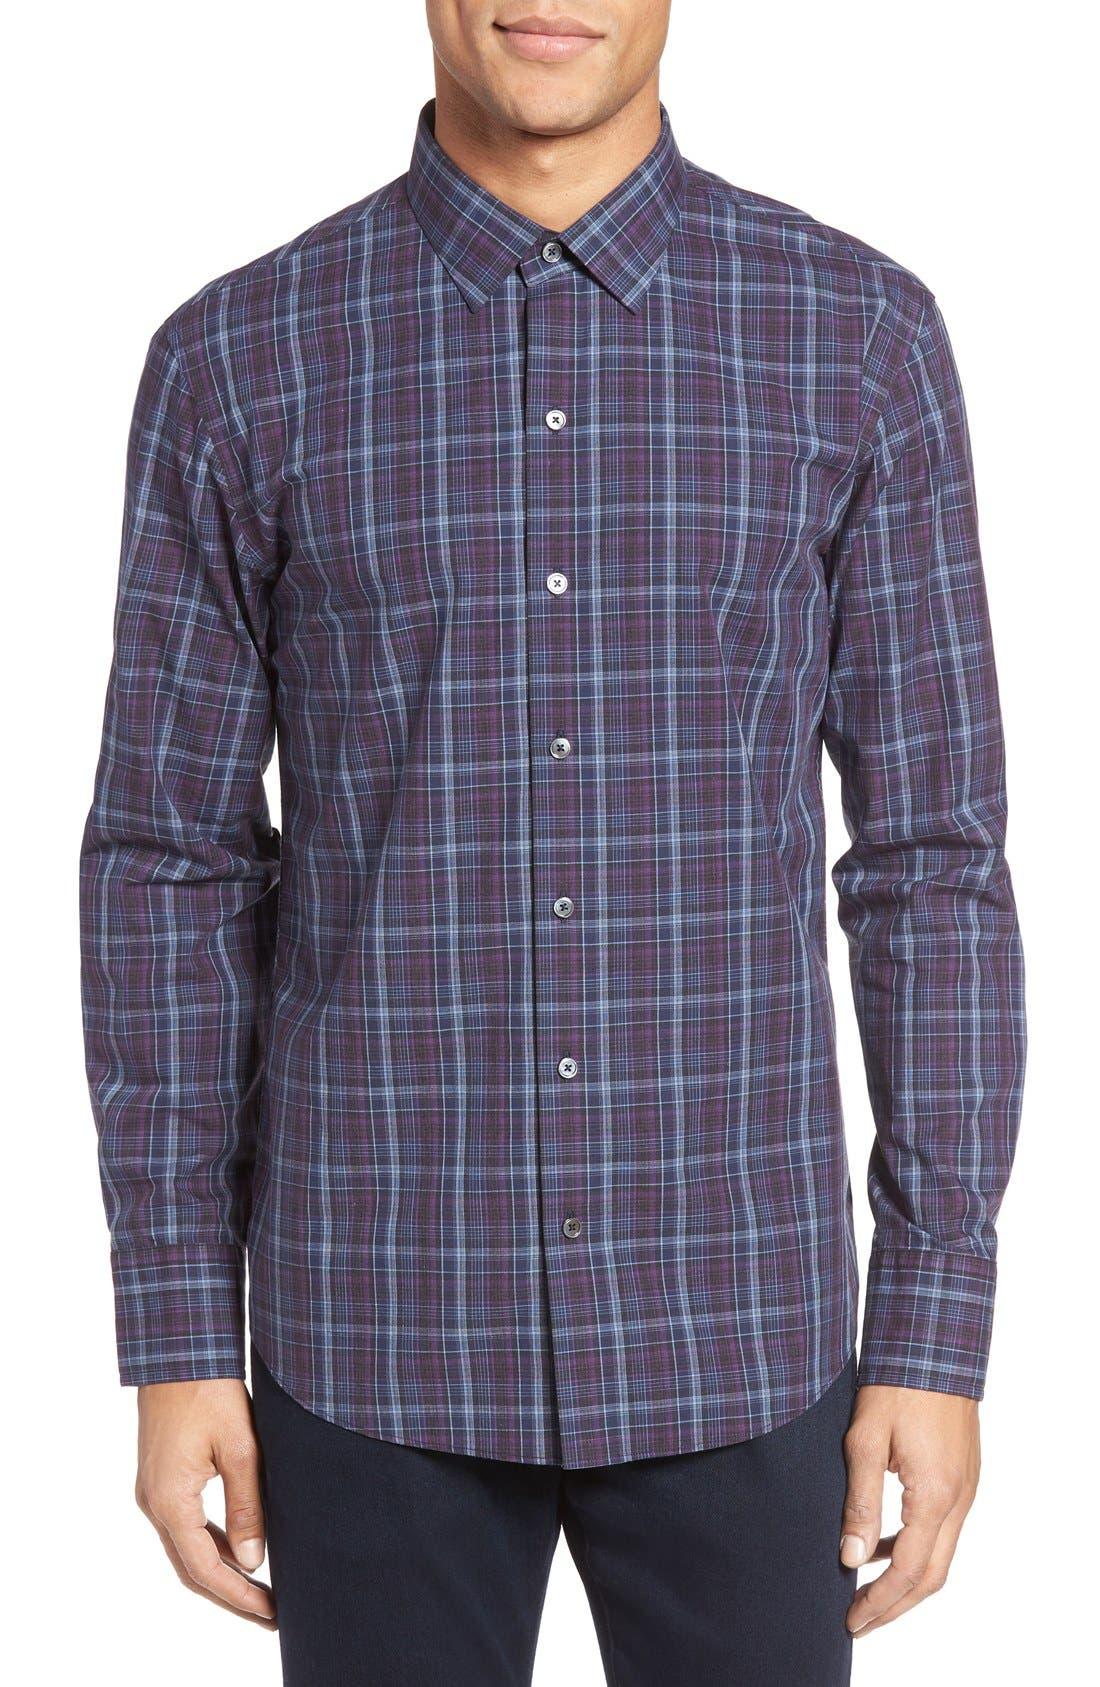 Main Image - Zachary Prell Bulatao Trim Fit Plaid Sport Shirt